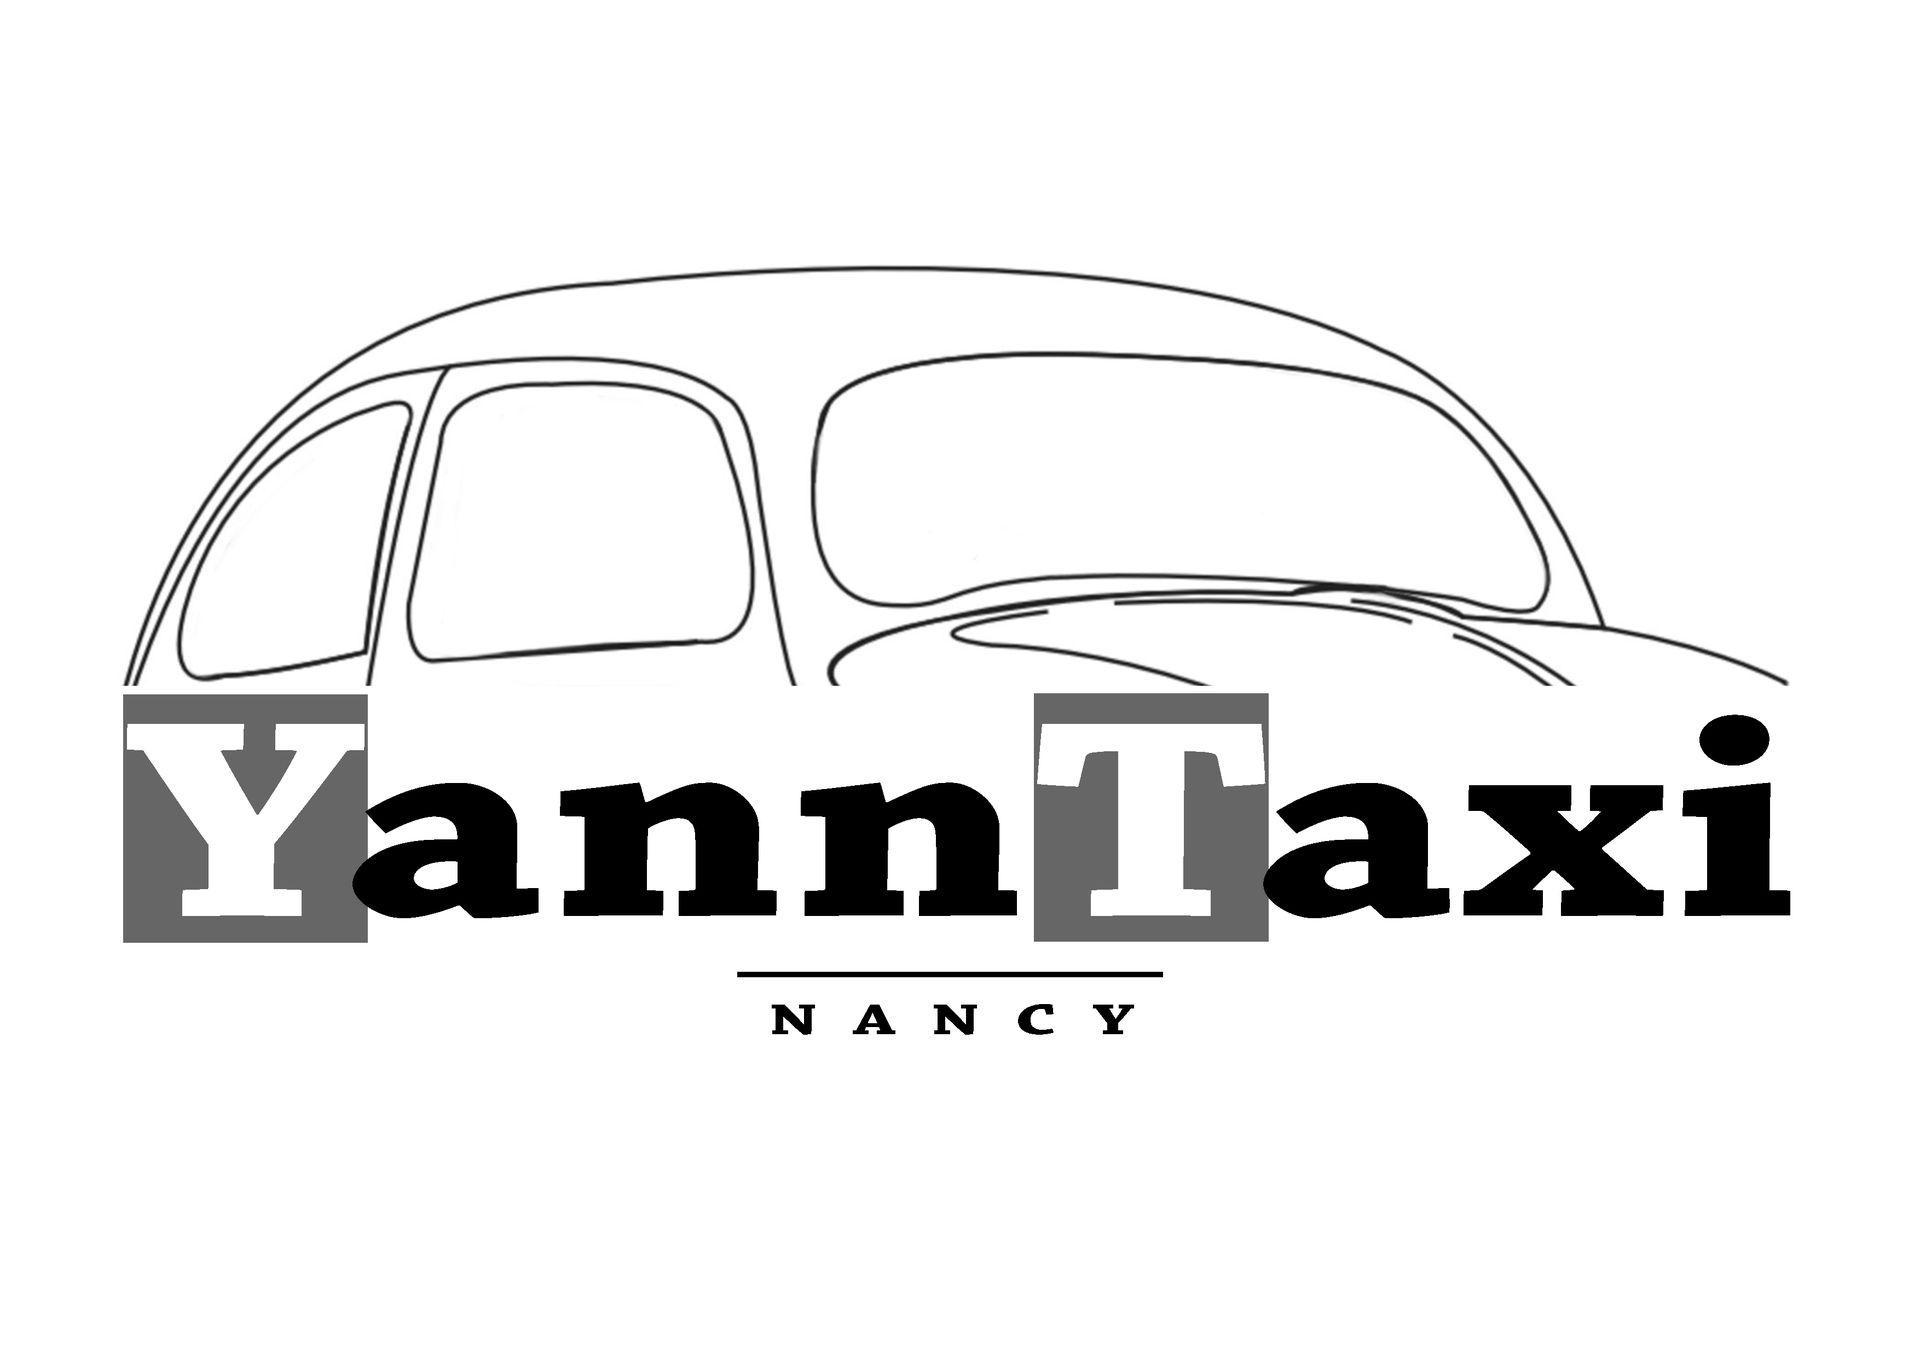 Yann Taxi Nancy taxi